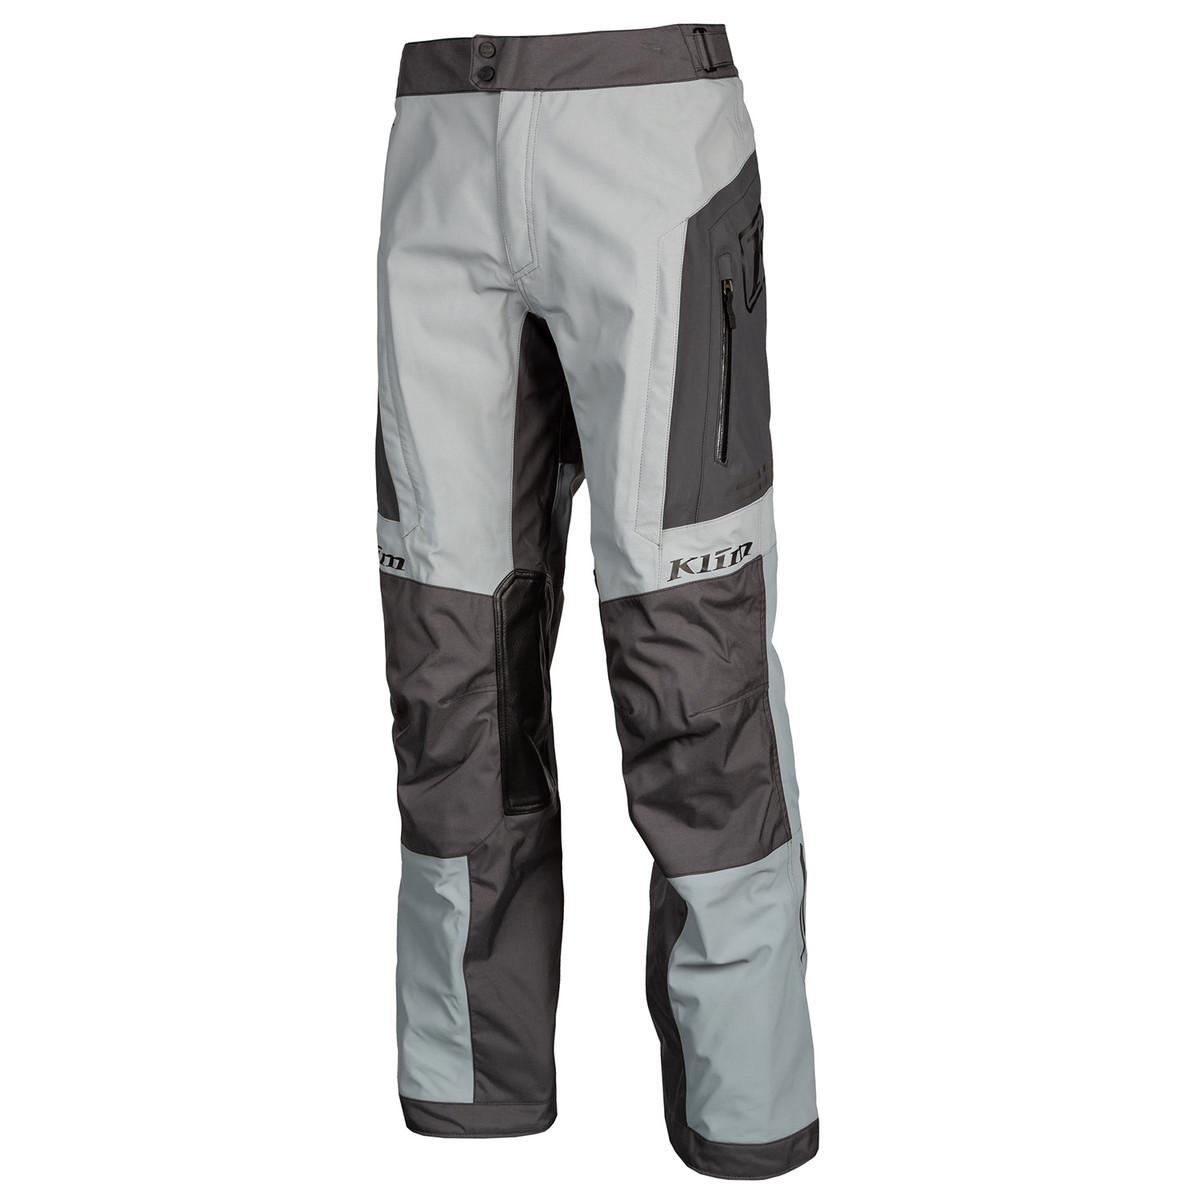 KLIM Traverse Pants Storm Grey